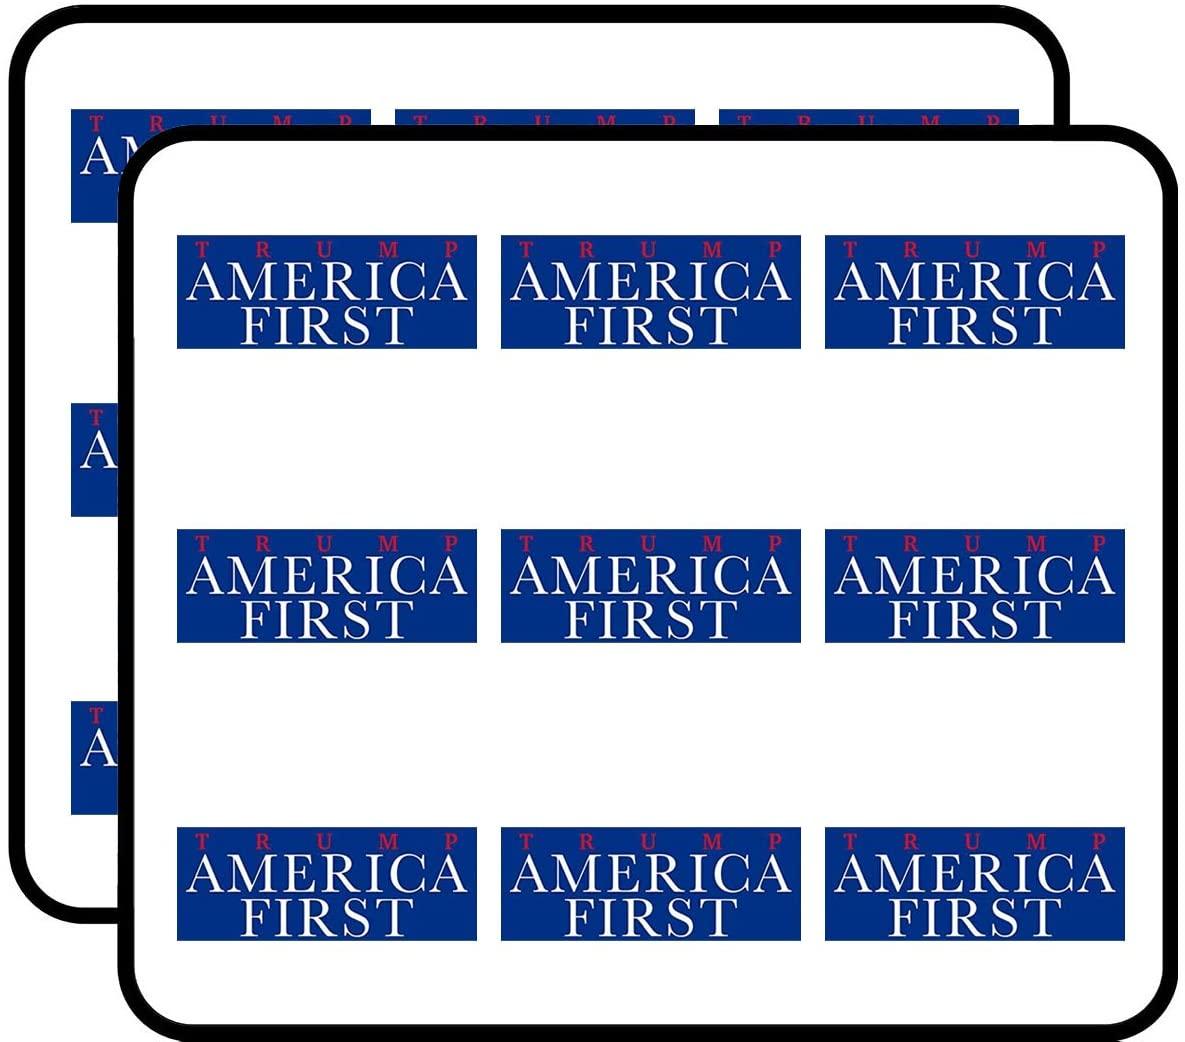 Trump America First (pro American Patriotic USA us) Sticker for Scrapbooking, Calendars, Arts, Album, Bullet Journals 2